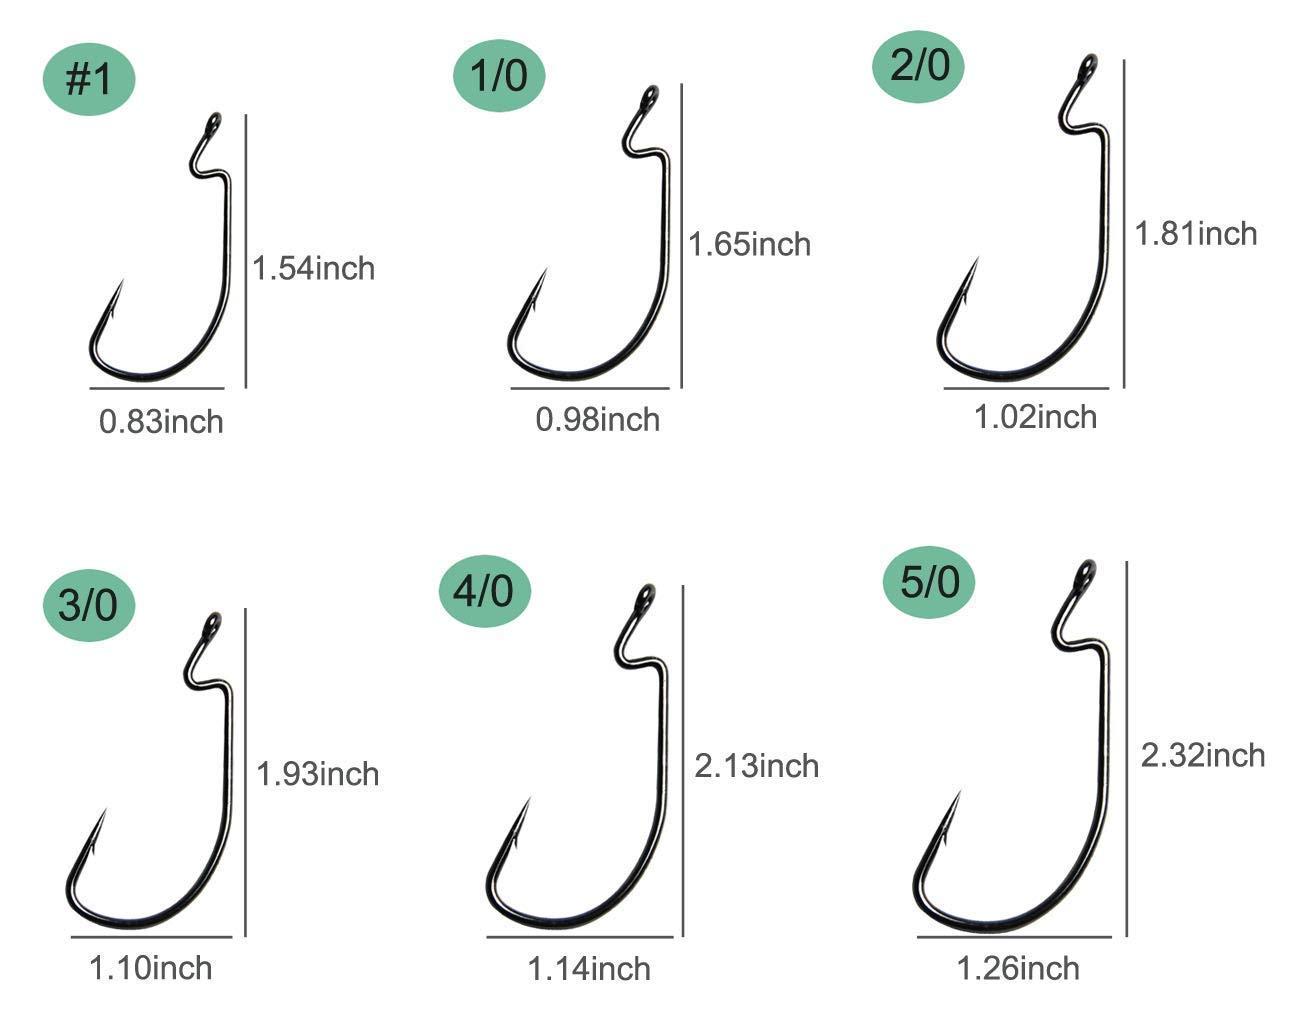 50pcs//100pcs Worm Fishing Hooks 38105 3X Worm Hooks Lure Baits Crank High Carbon Steel Wide Gap Offset Bass Worm Hooks Size 1,1//0,2//0,3//0,4//0,5//0 Saltwater Fishing Accessories